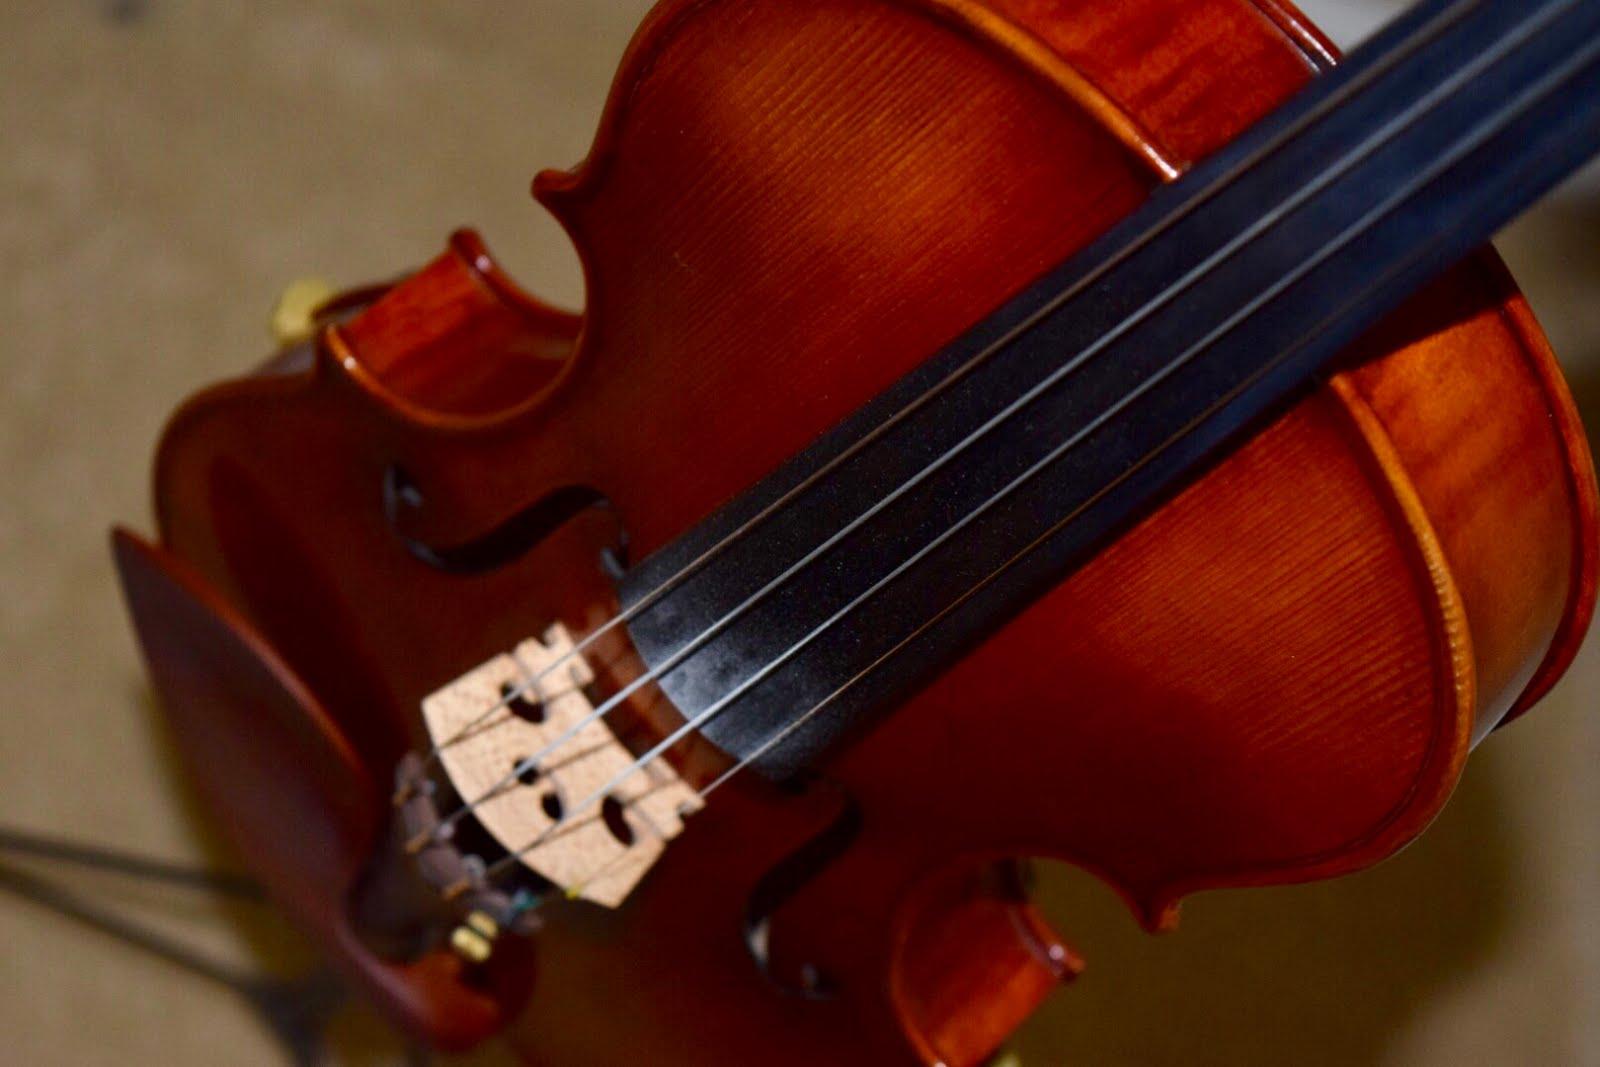 My Instrument - Ming